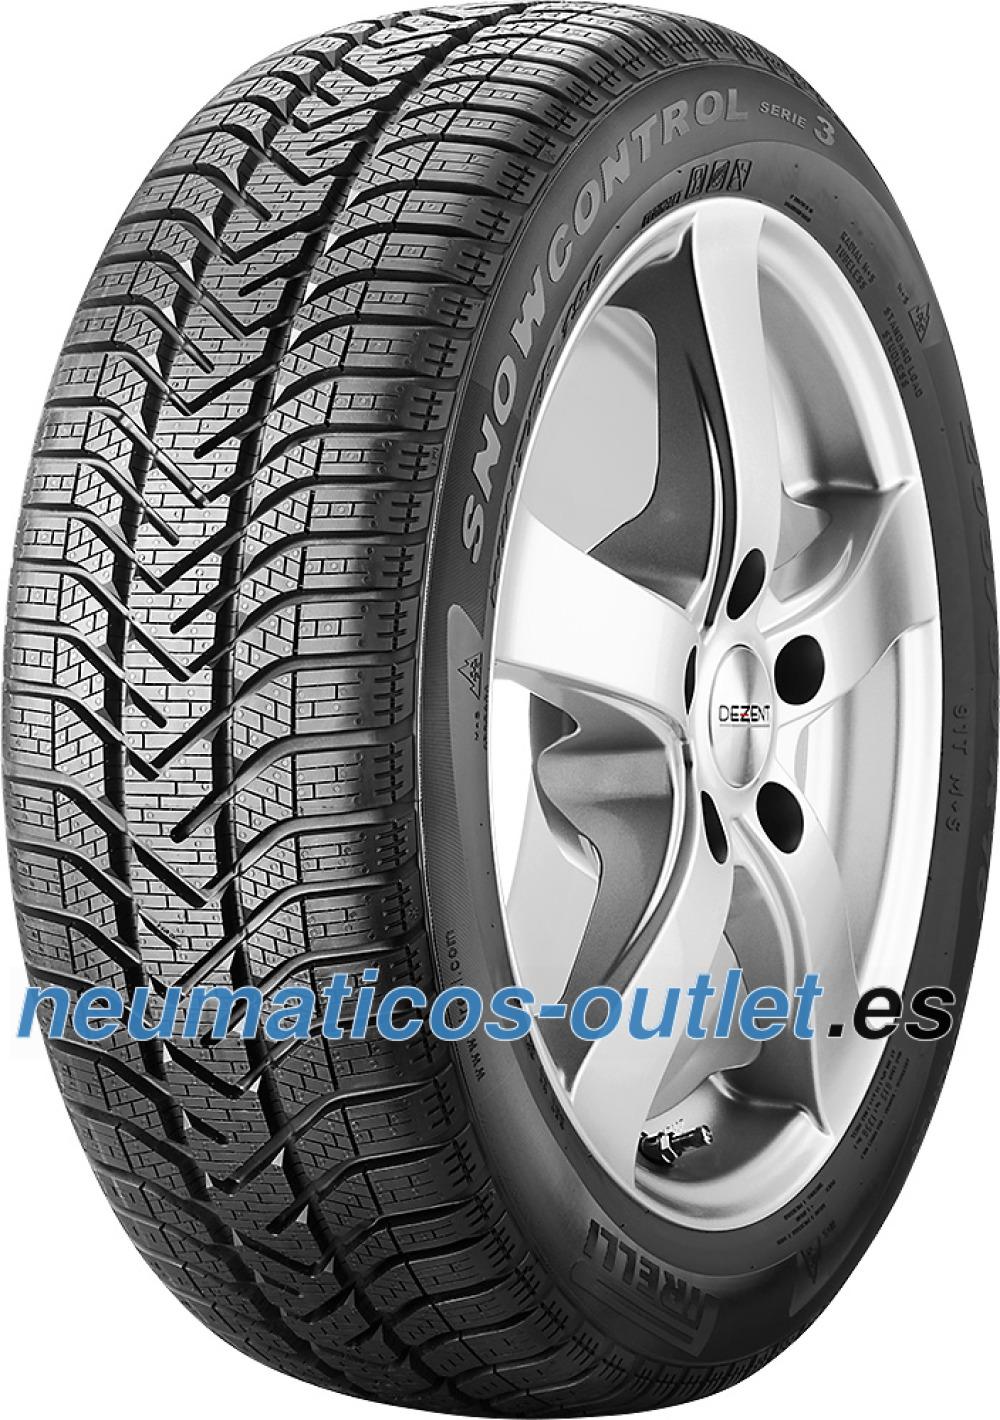 Pirelli W 190 Snowcontrol Serie III ( 185/50 R16 81T , ECOIMPACT )